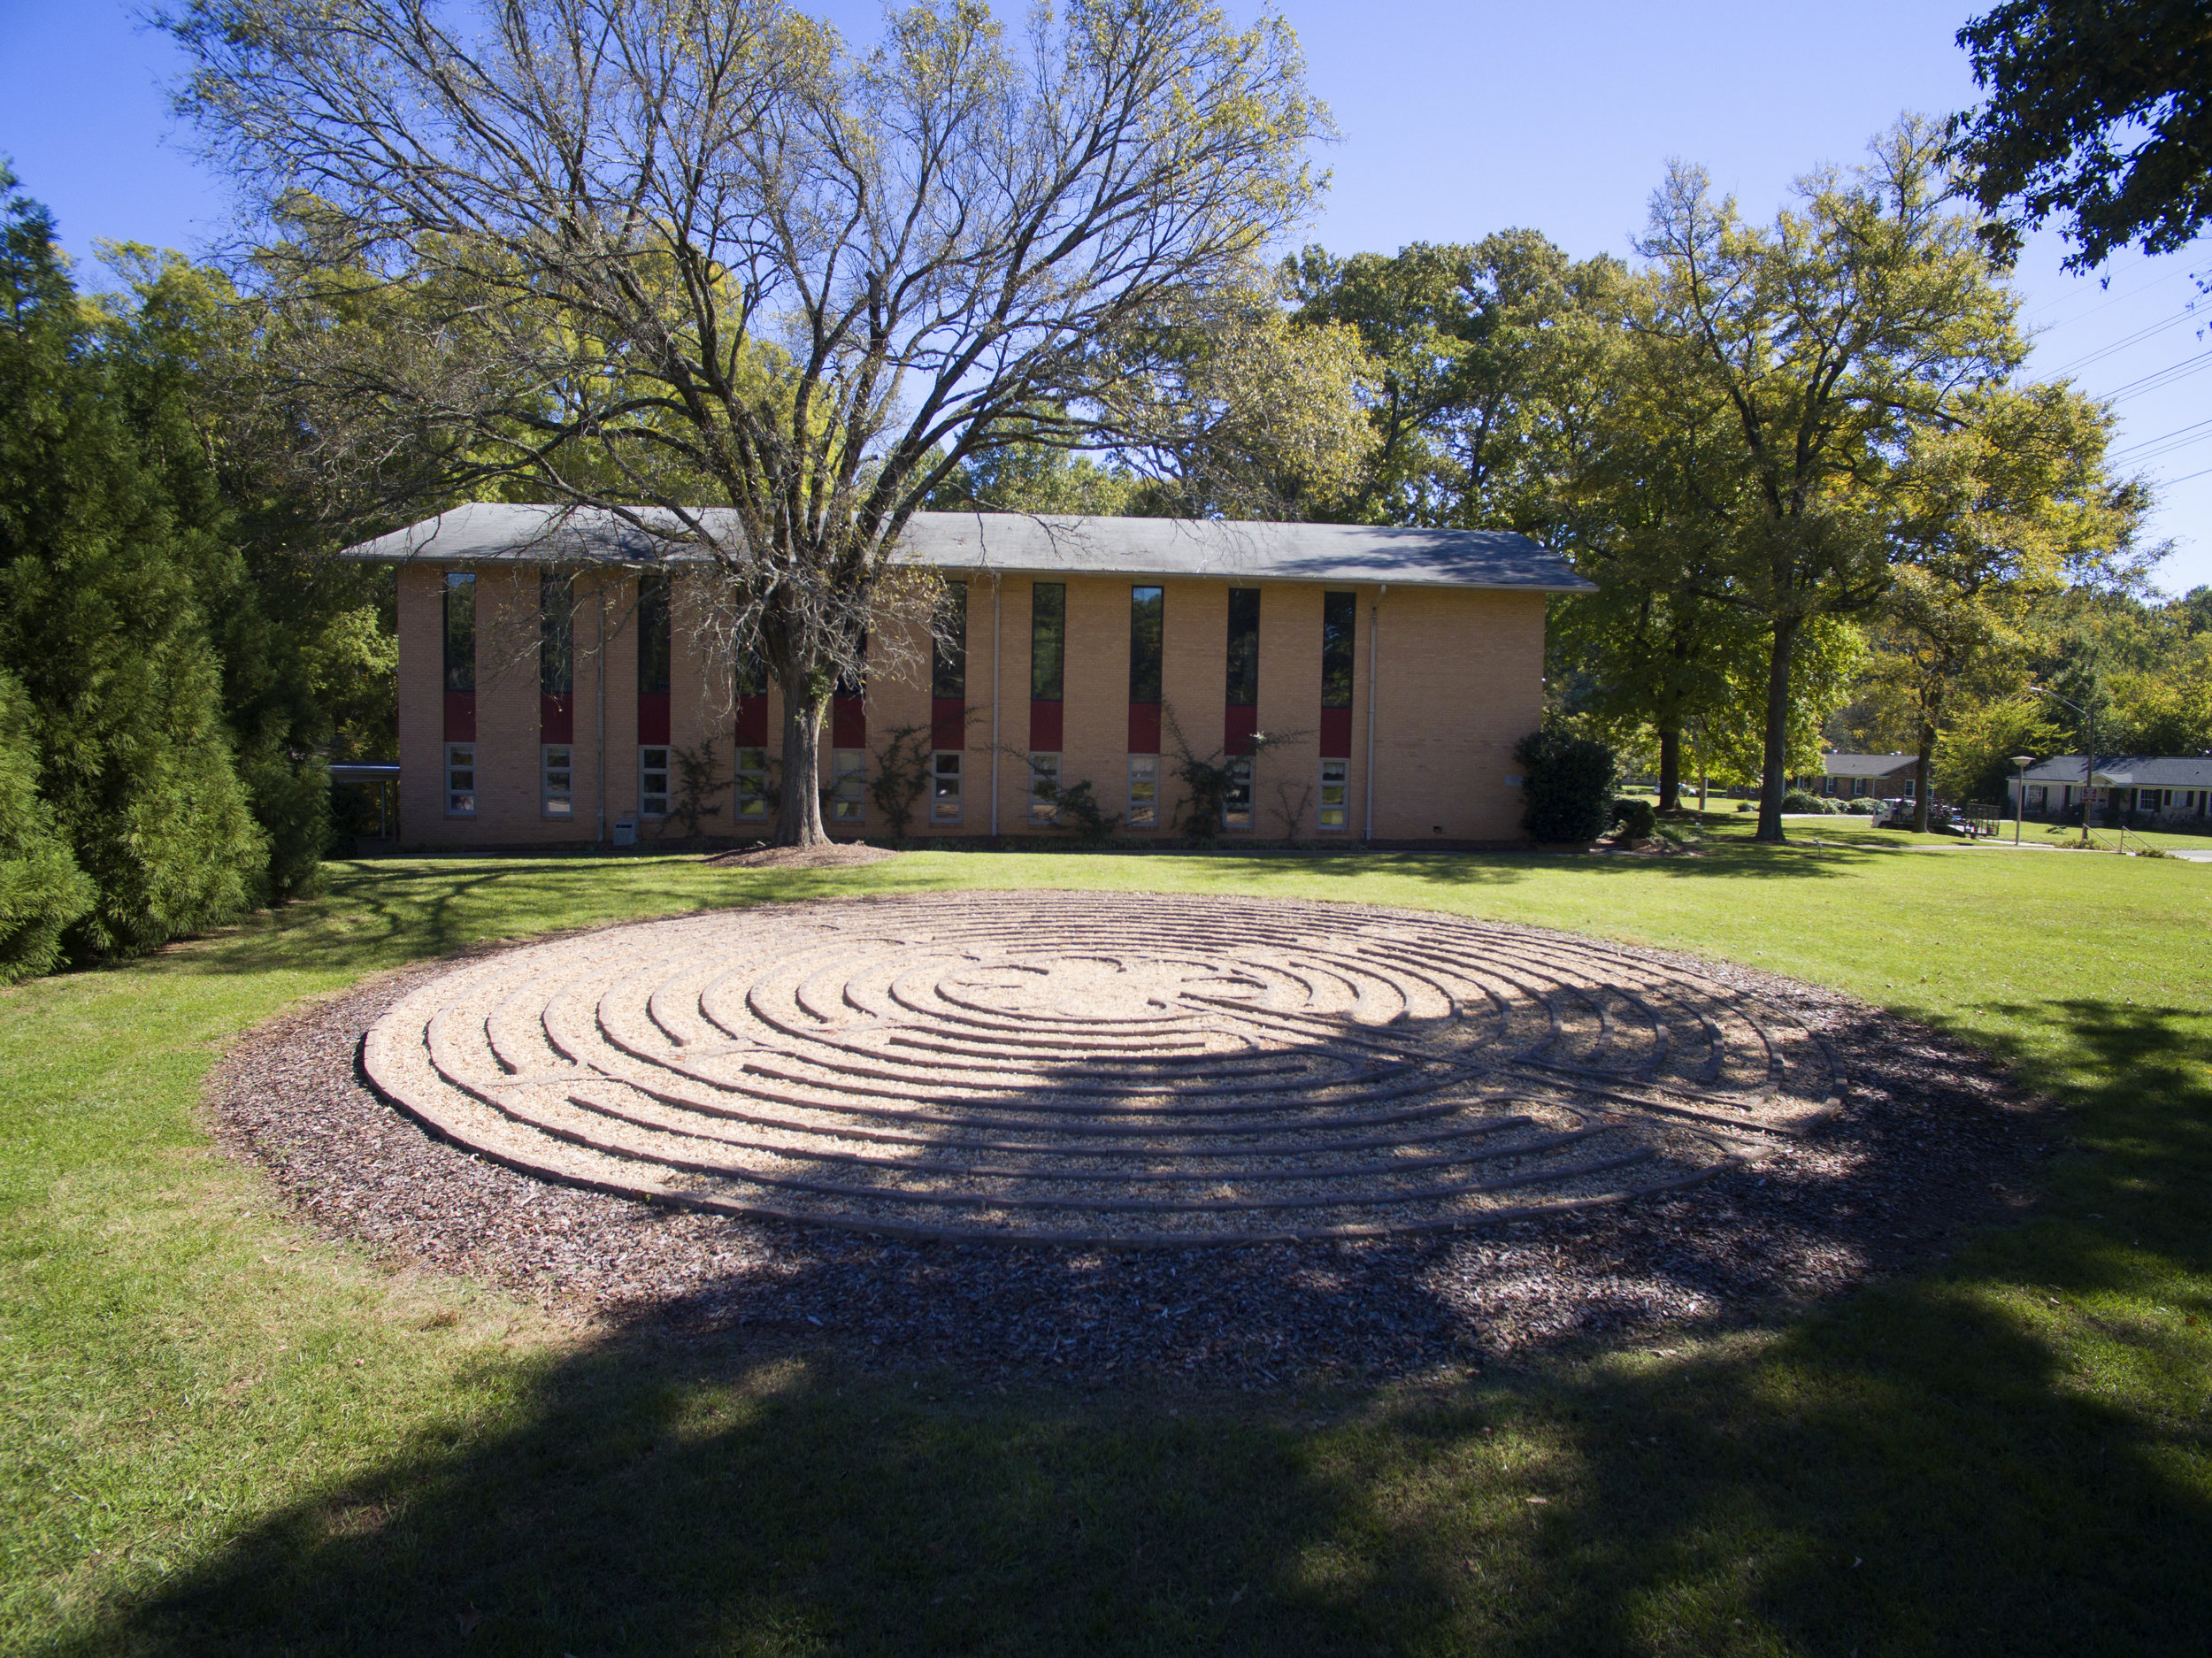 labyrinth drone 1.jpg